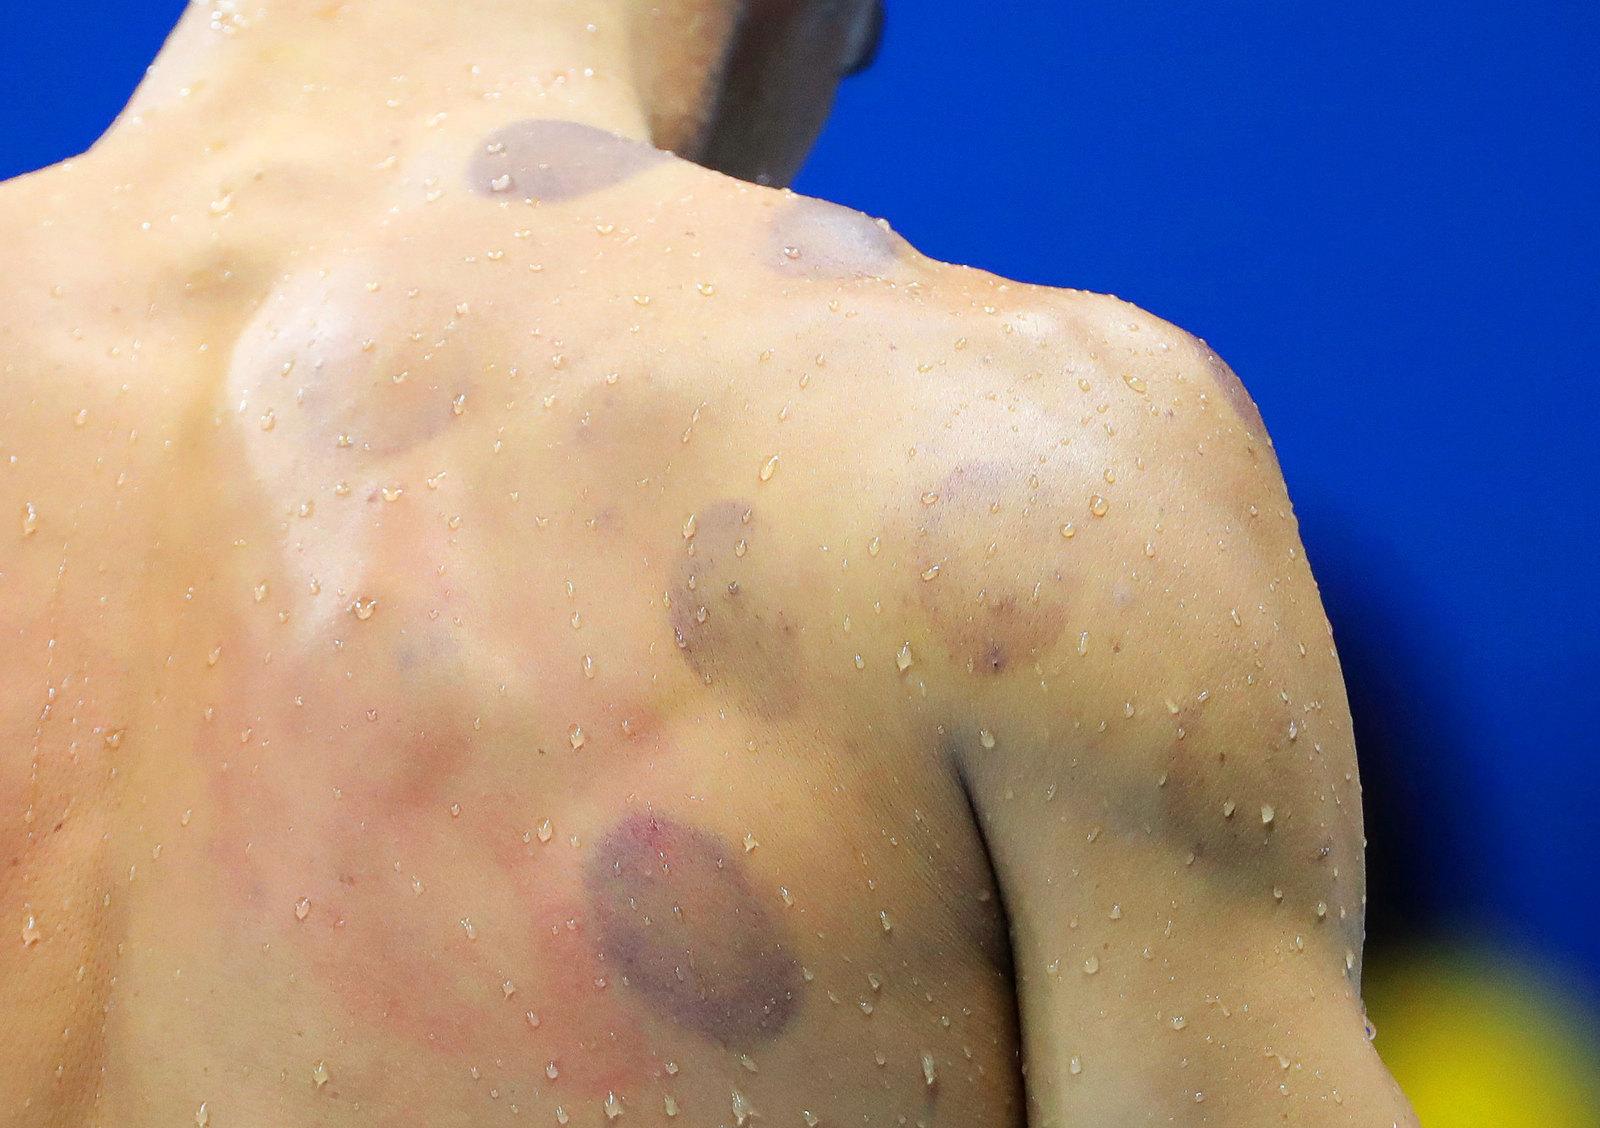 Спина легендарного пловца Майкла Фелпса усыпана следами от медицинских банок